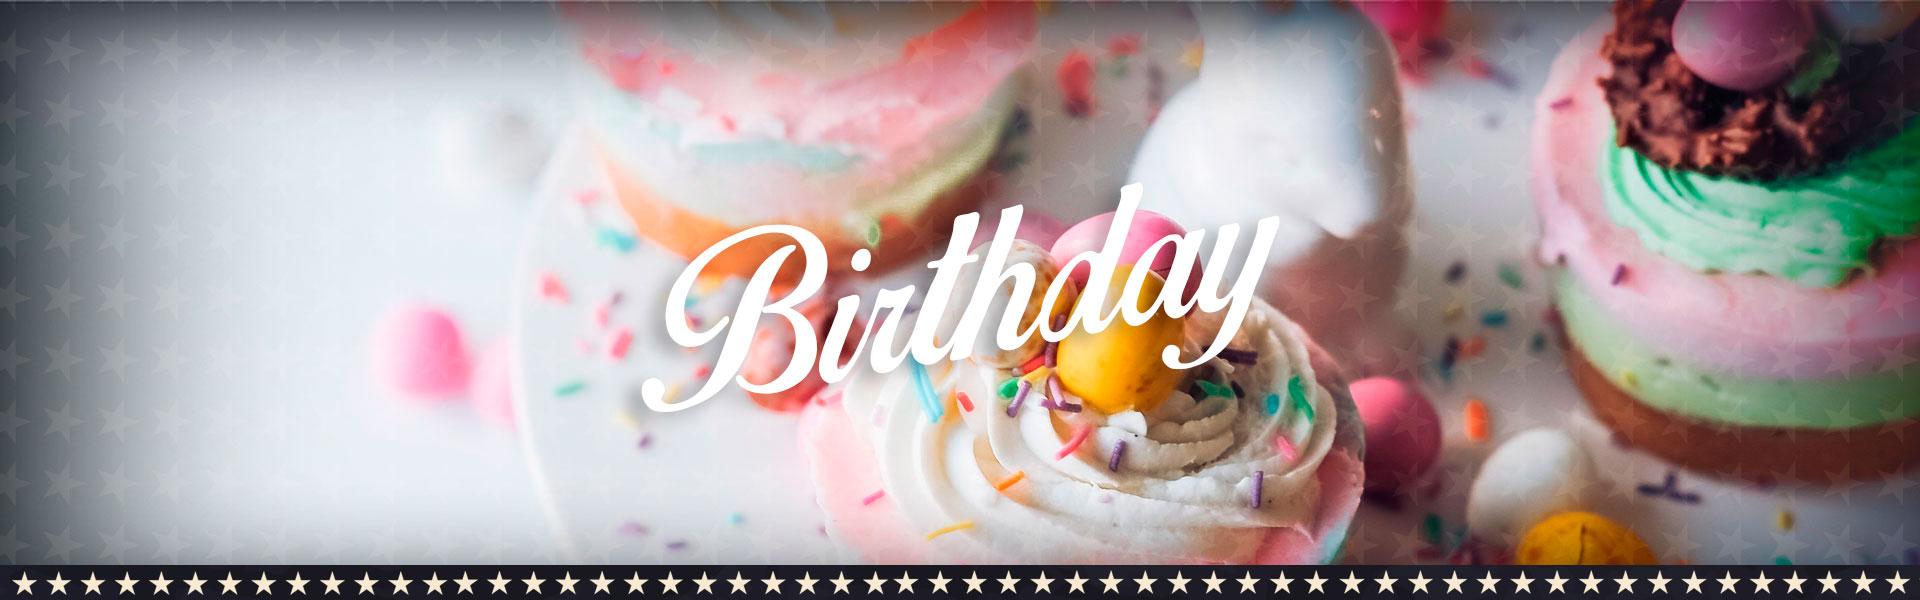 Header_birthday